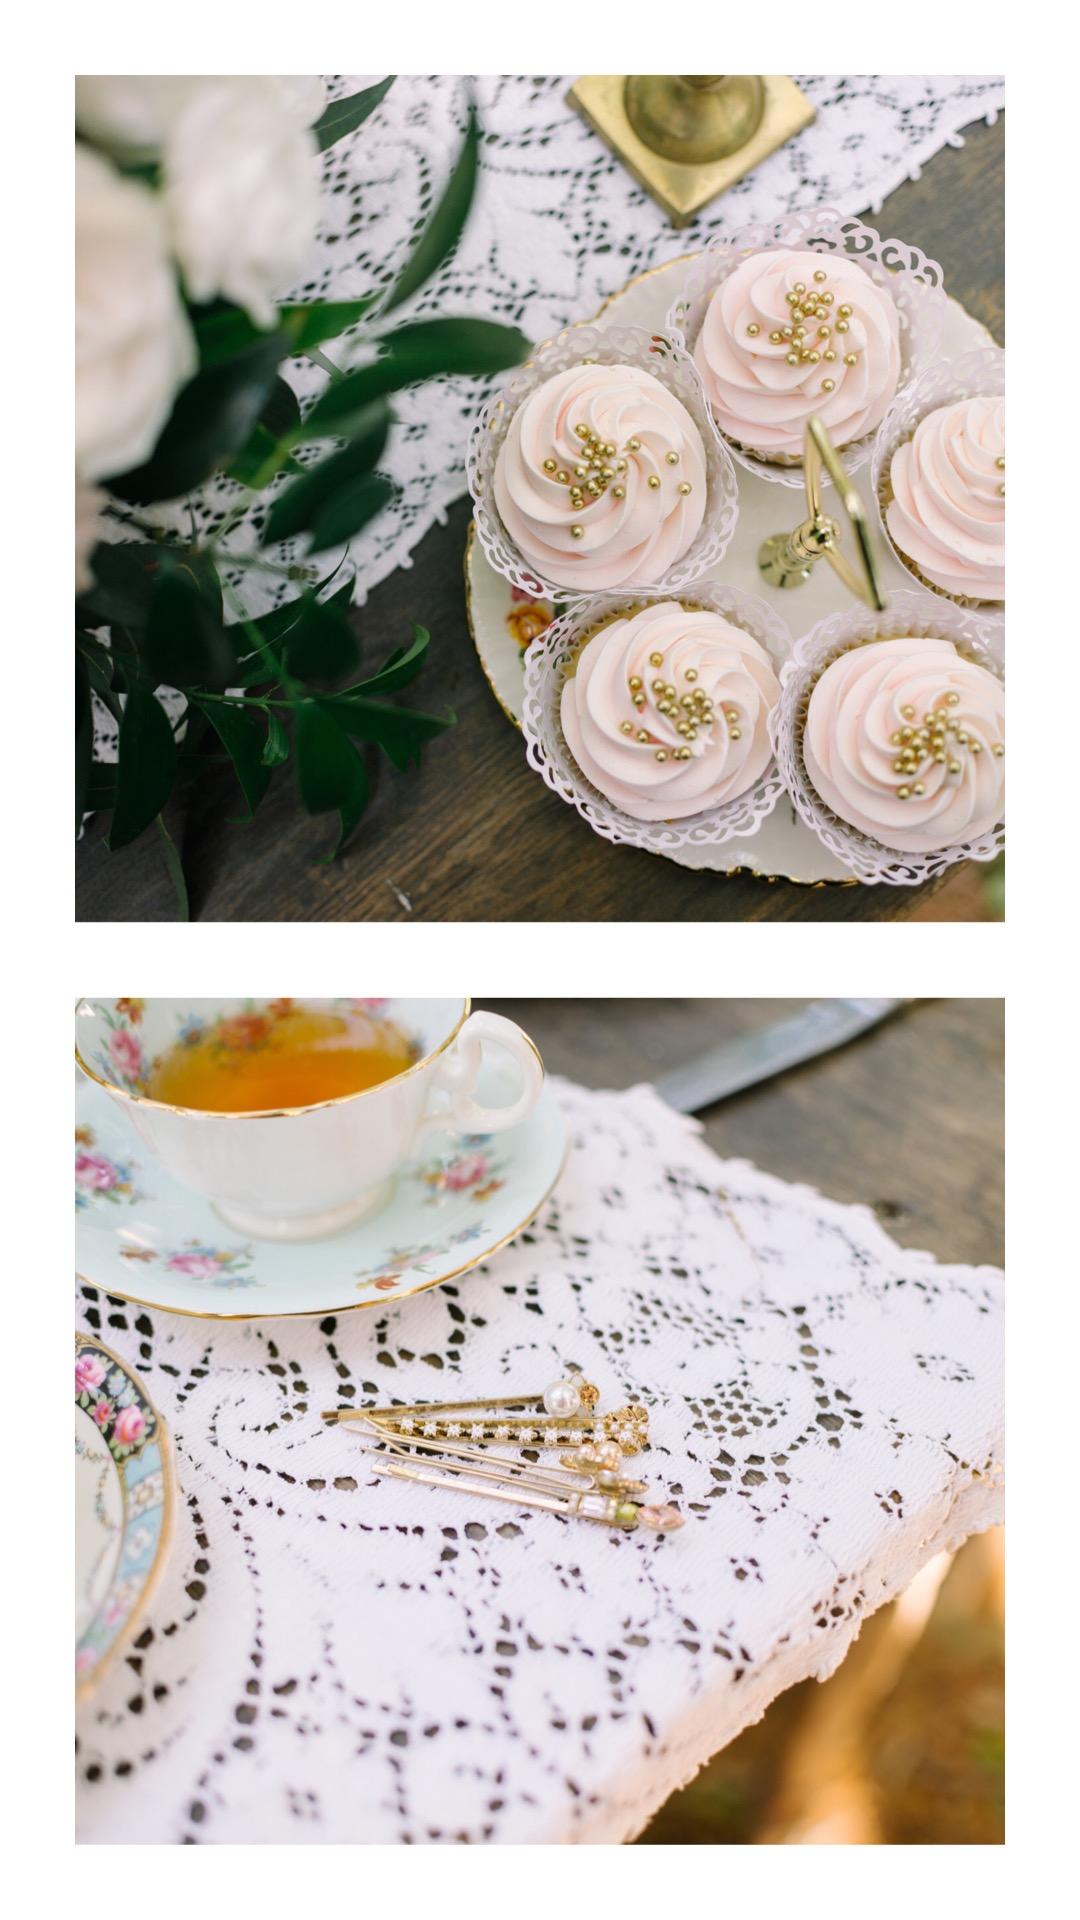 Halifax Wedding Photographer Styled Shoot - Gray Weddings & Events - Sinead Dubeau Photography 06